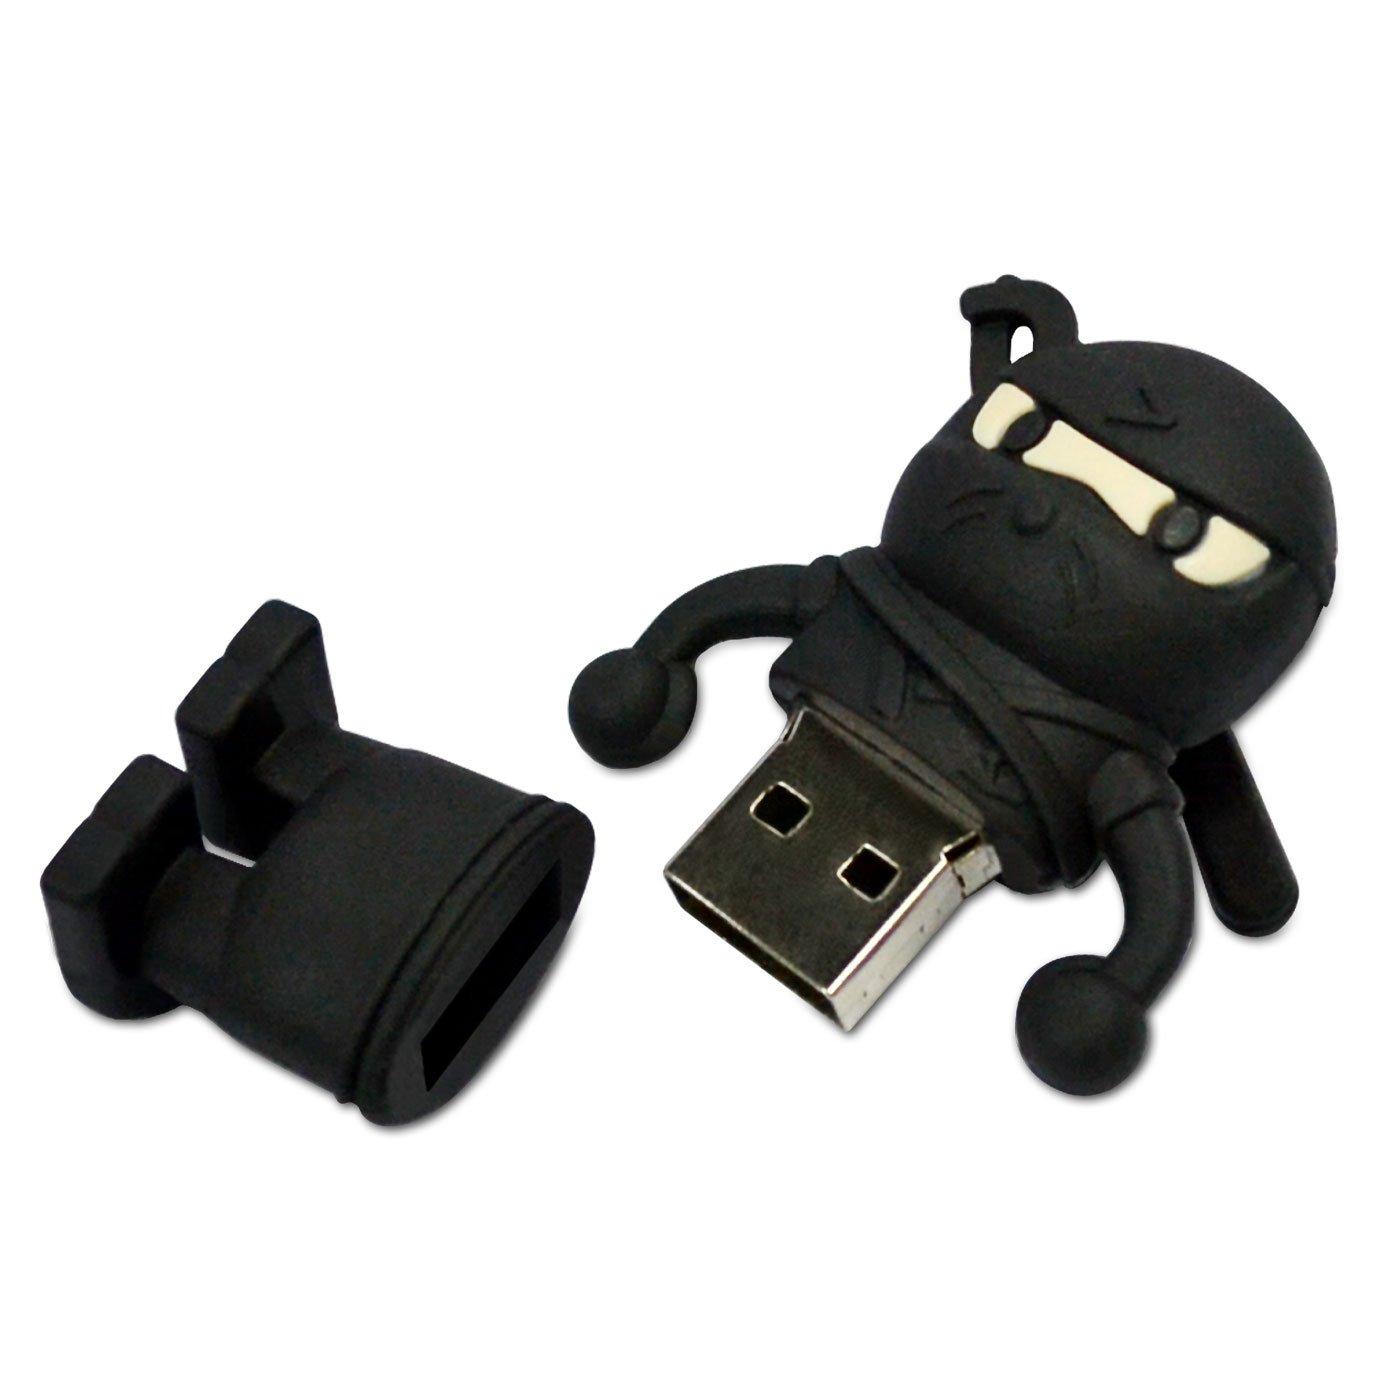 NR31500080016 Hi-SPEED MEMORIA USB STICK 16GB FLASH NINJA LUCHADOR NEGRO